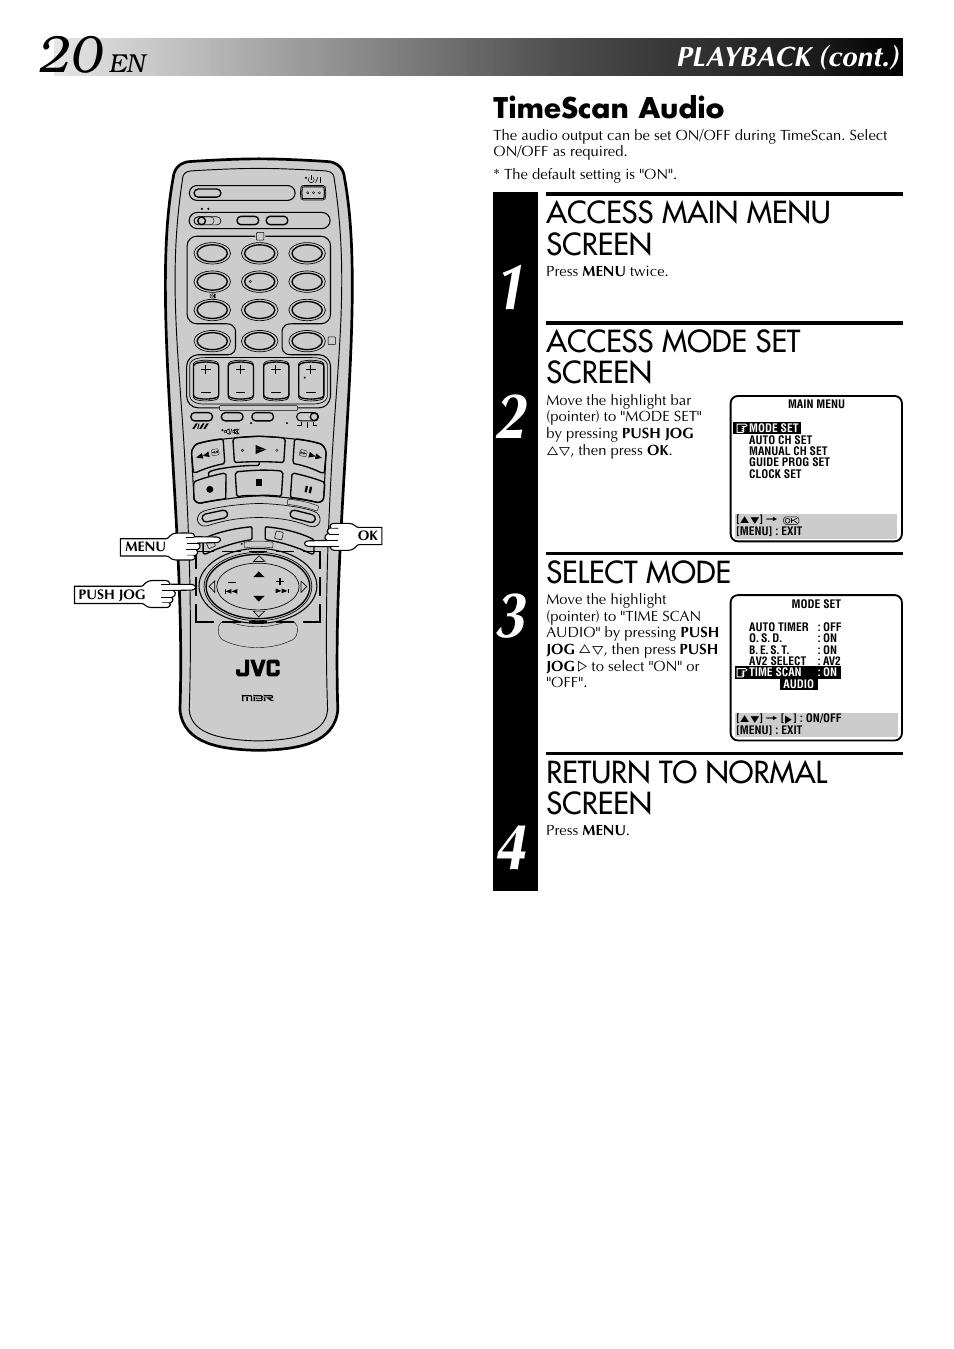 Access main menu screen, Access mode set screen, Select